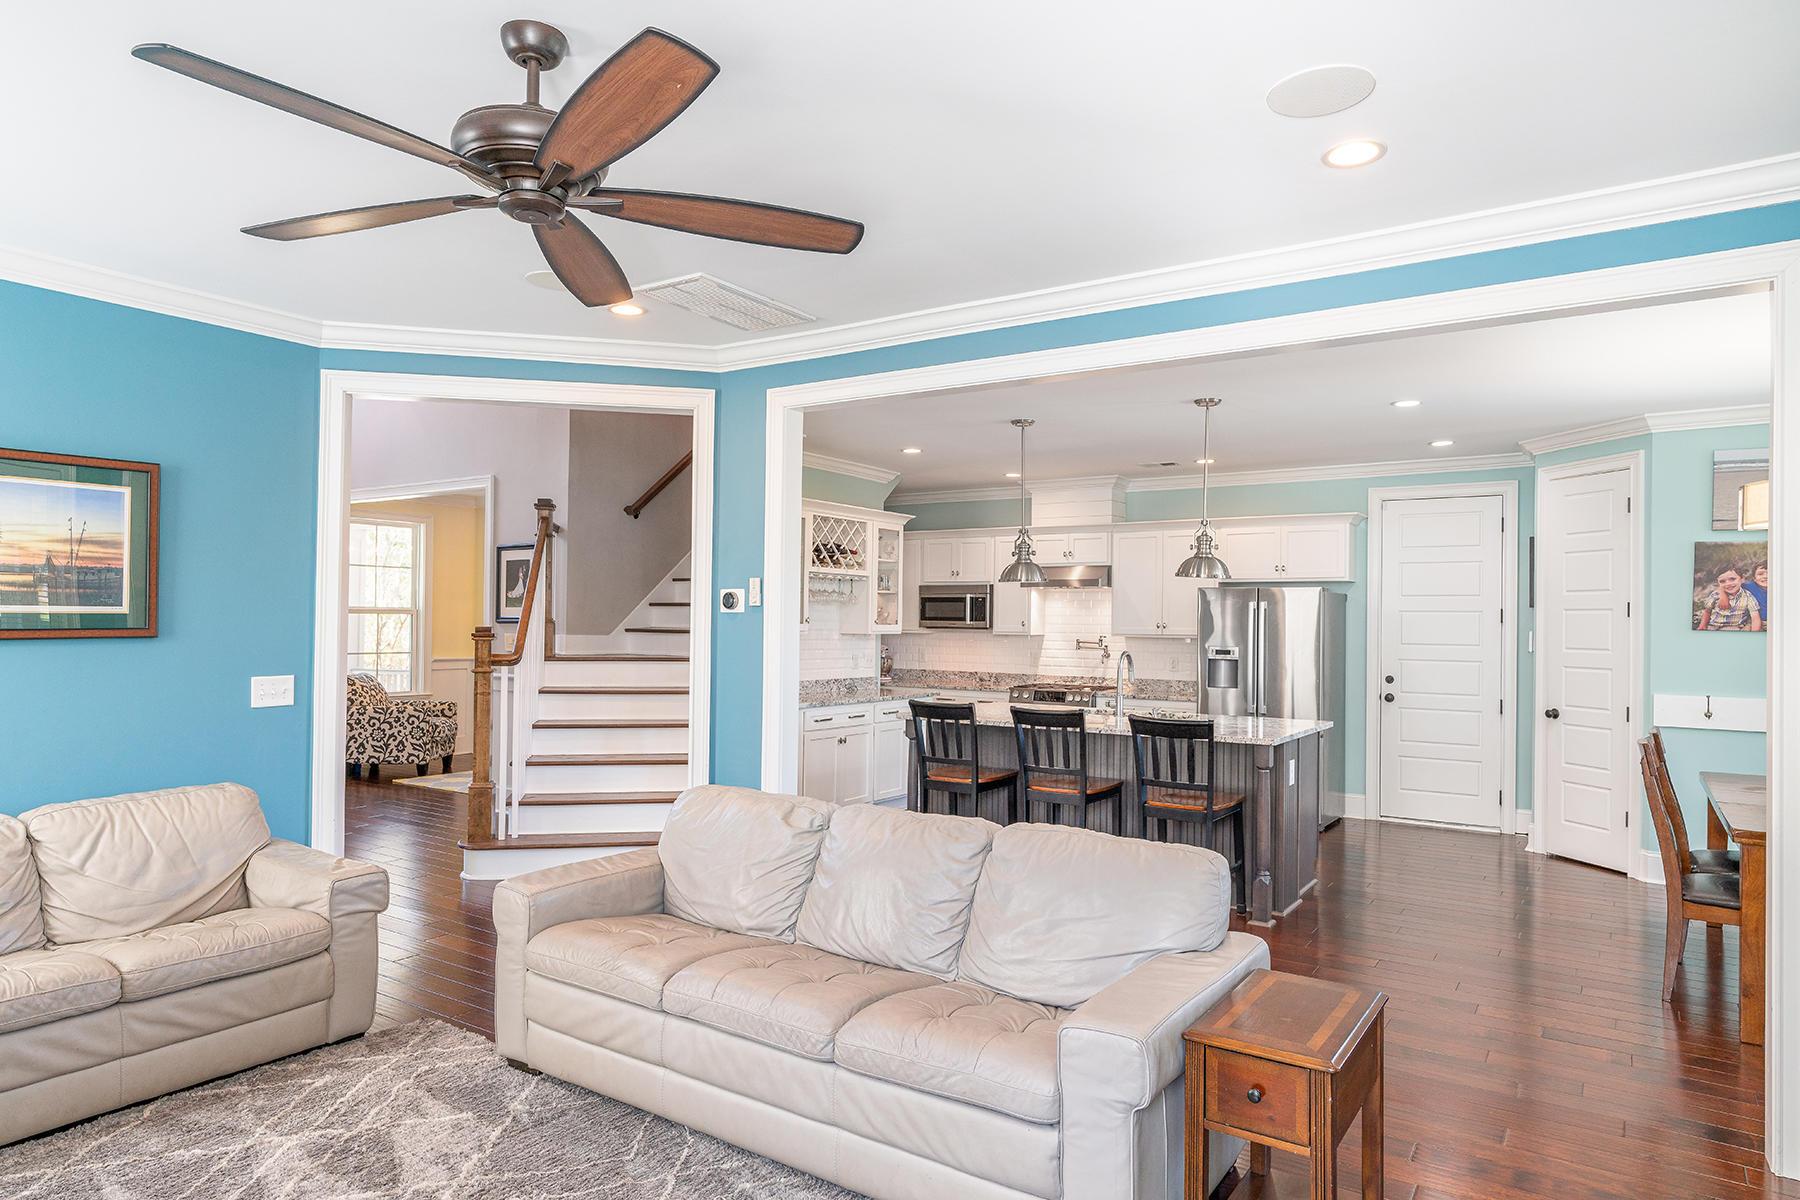 Scotts Creek Homes For Sale - 1389 Scotts Creek, Mount Pleasant, SC - 16